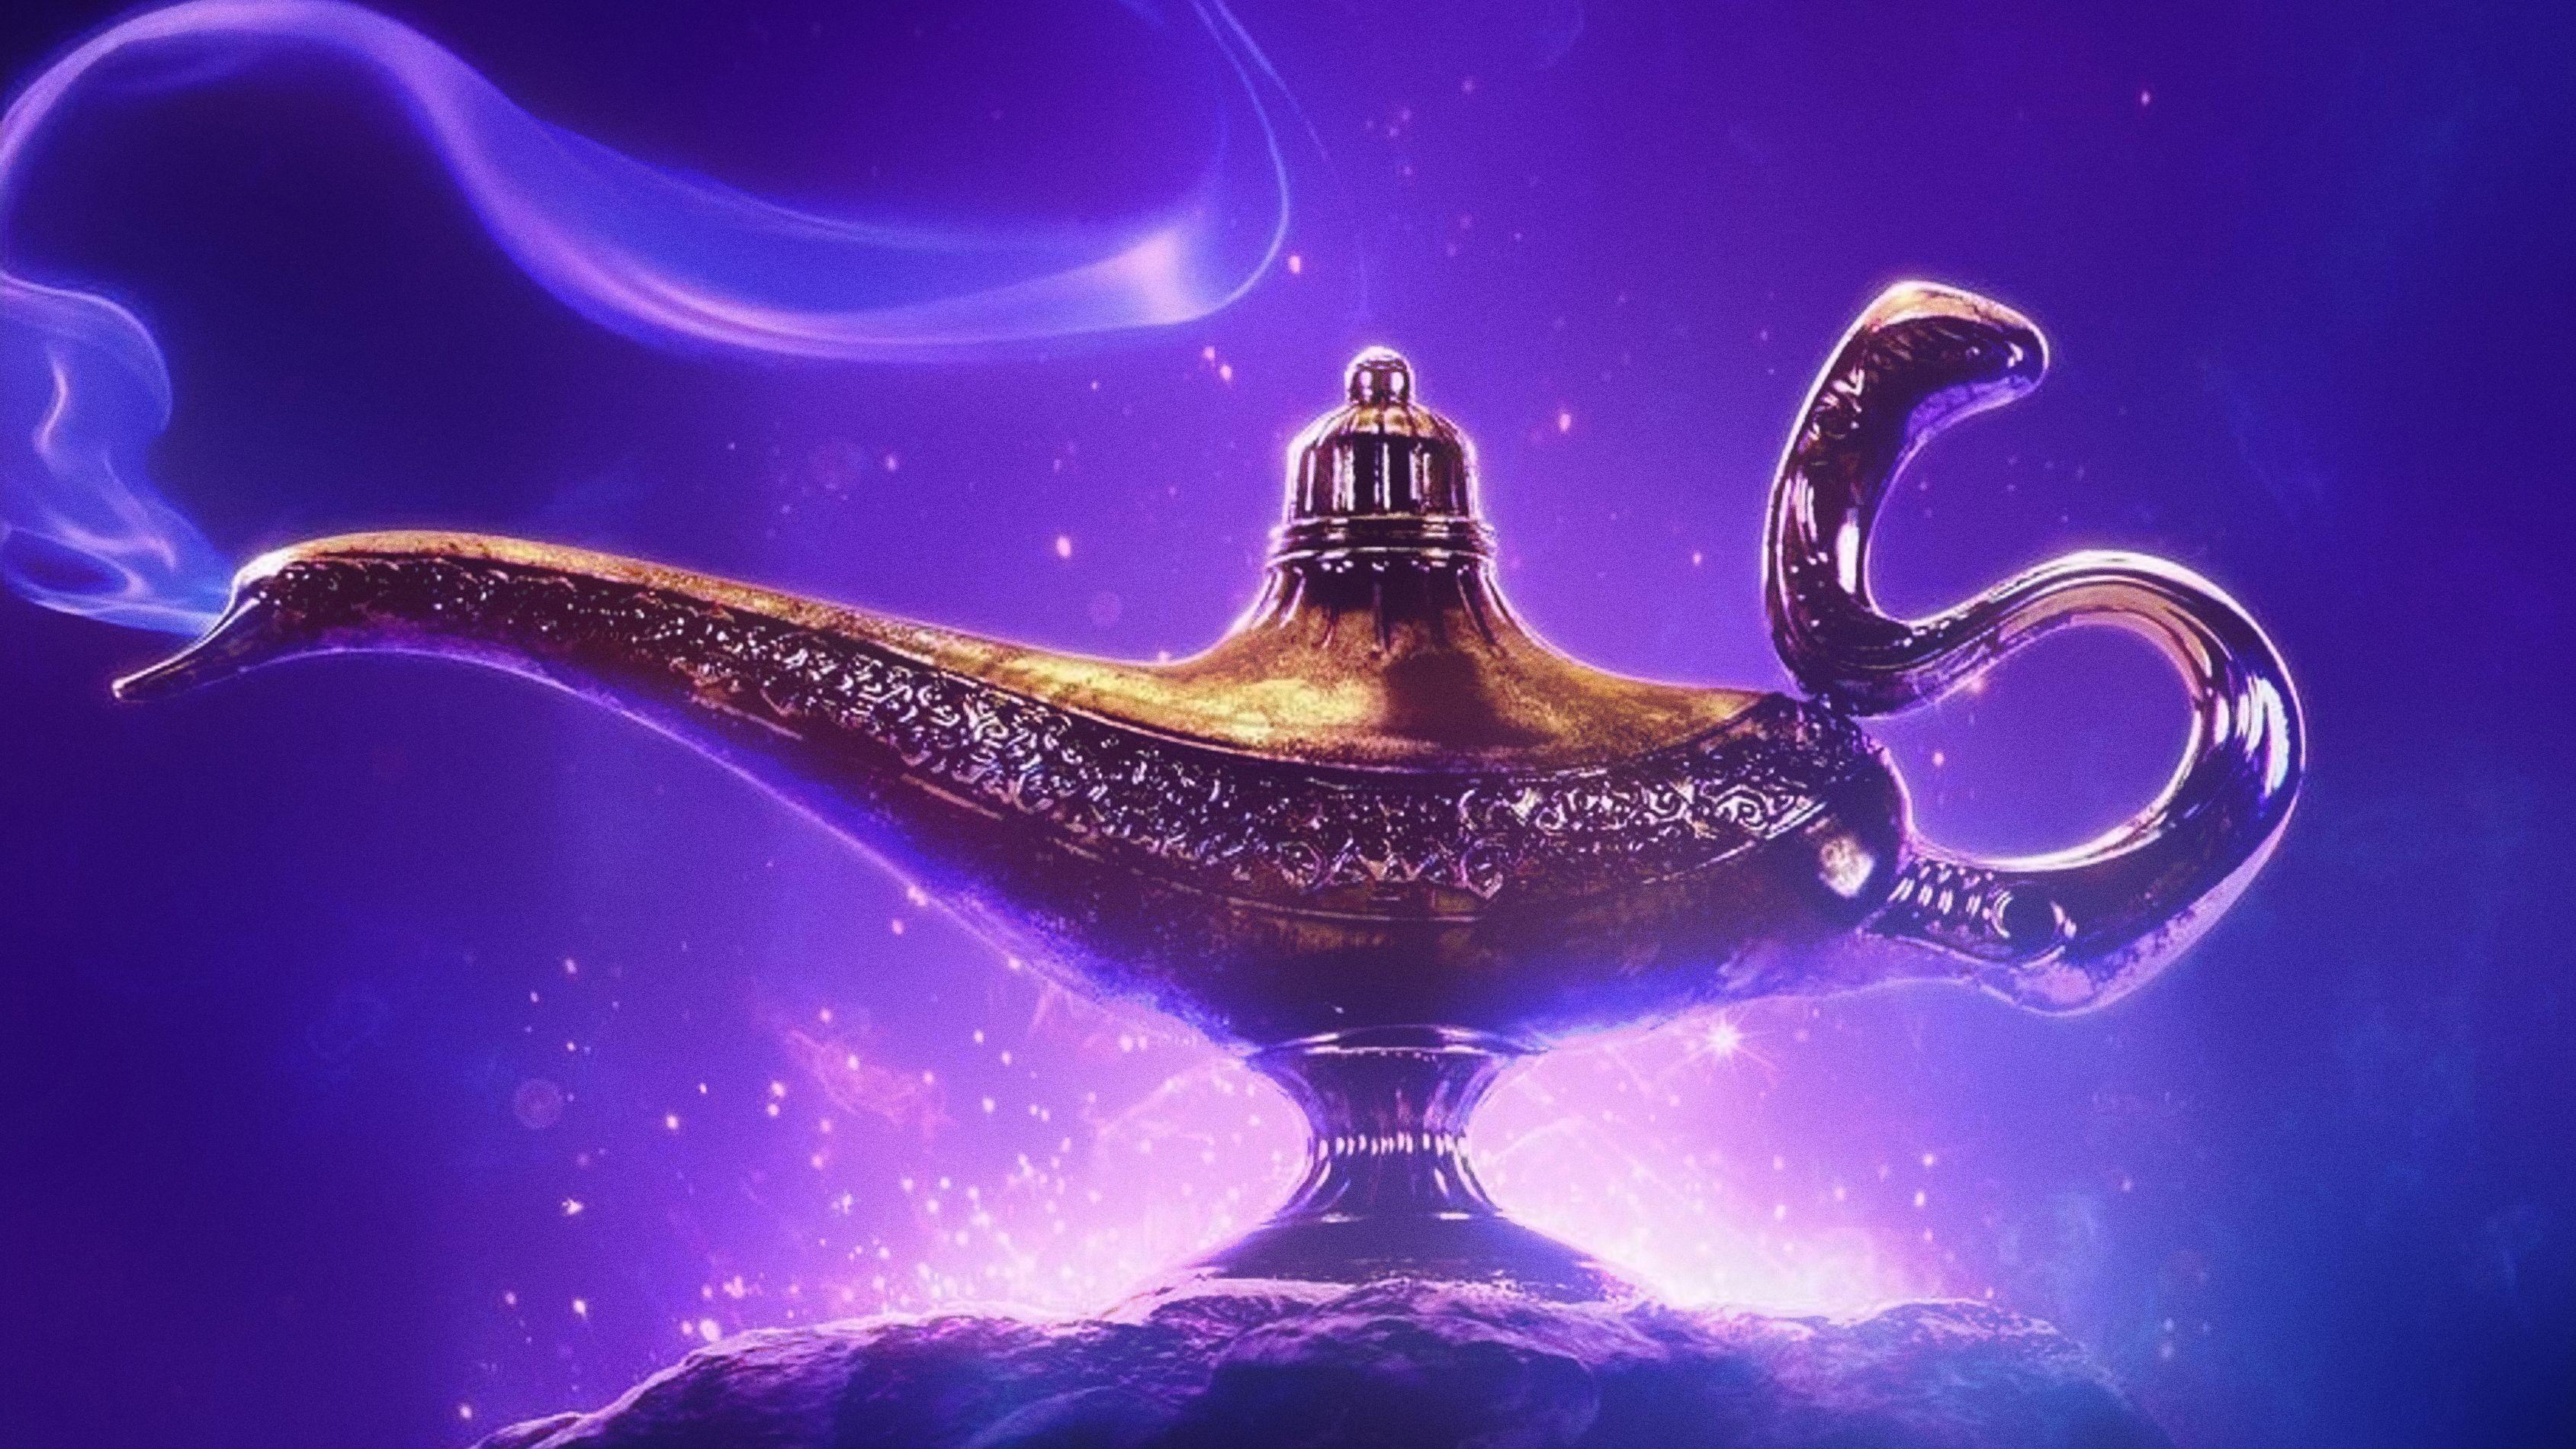 Aladdin 4k Wallpapers Top Free Aladdin 4k Backgrounds